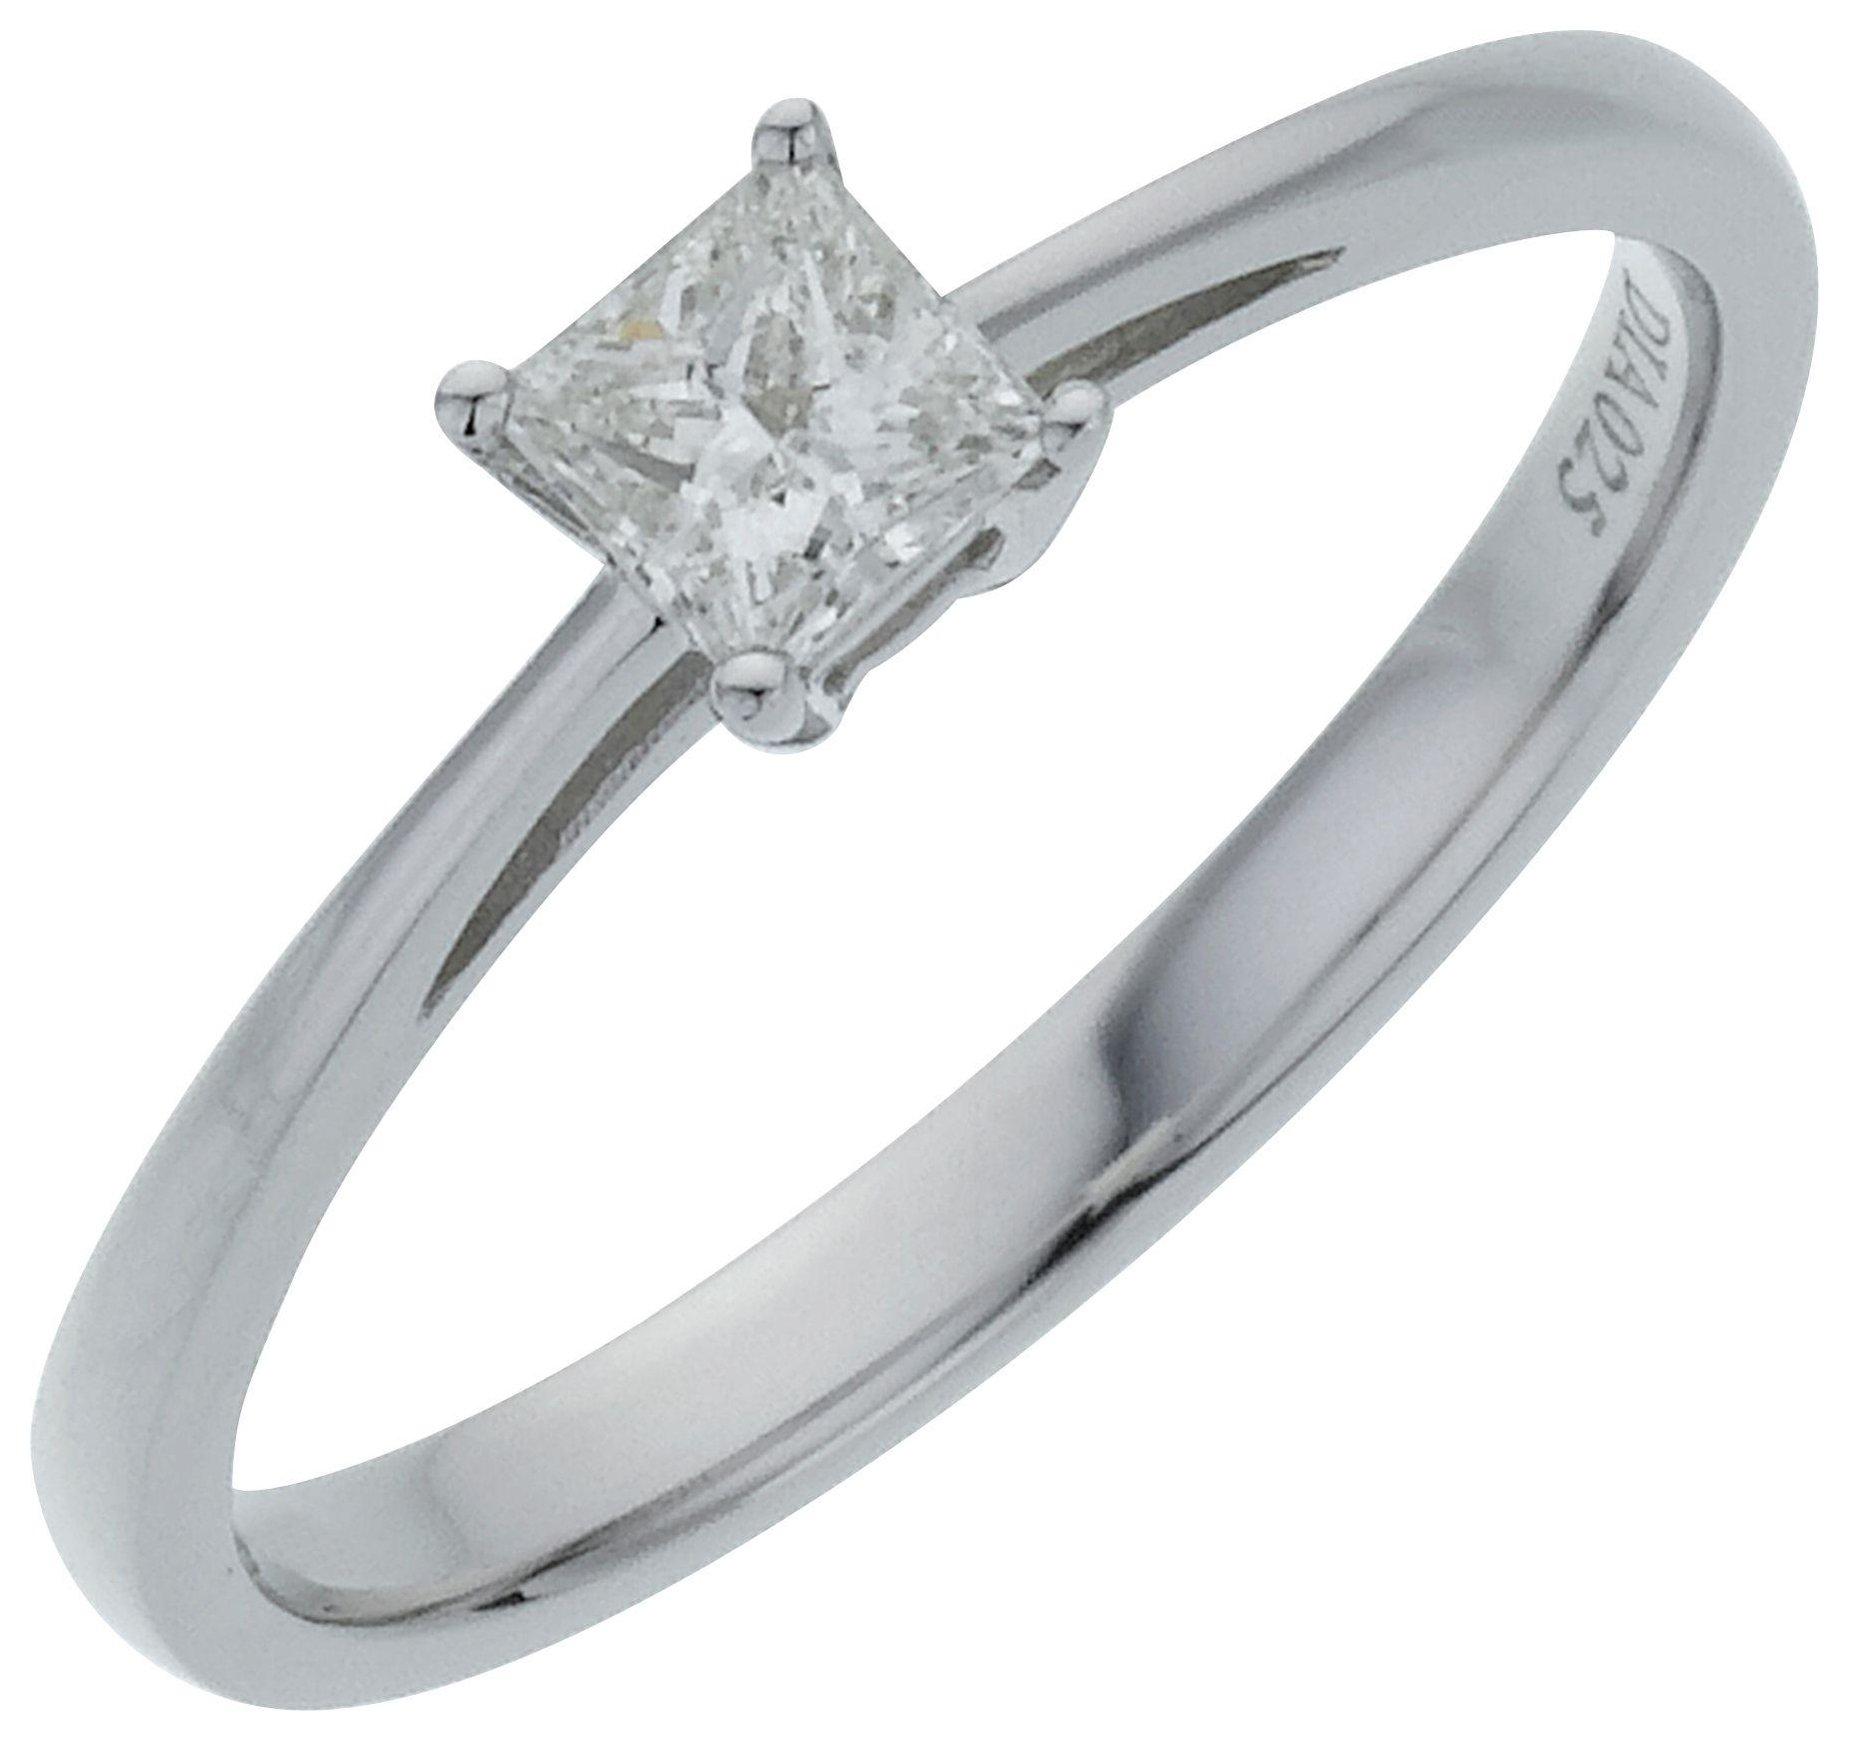 18 Carat White Gold 025 Carat Diamond - Princess Cut Diamond - Ring - V